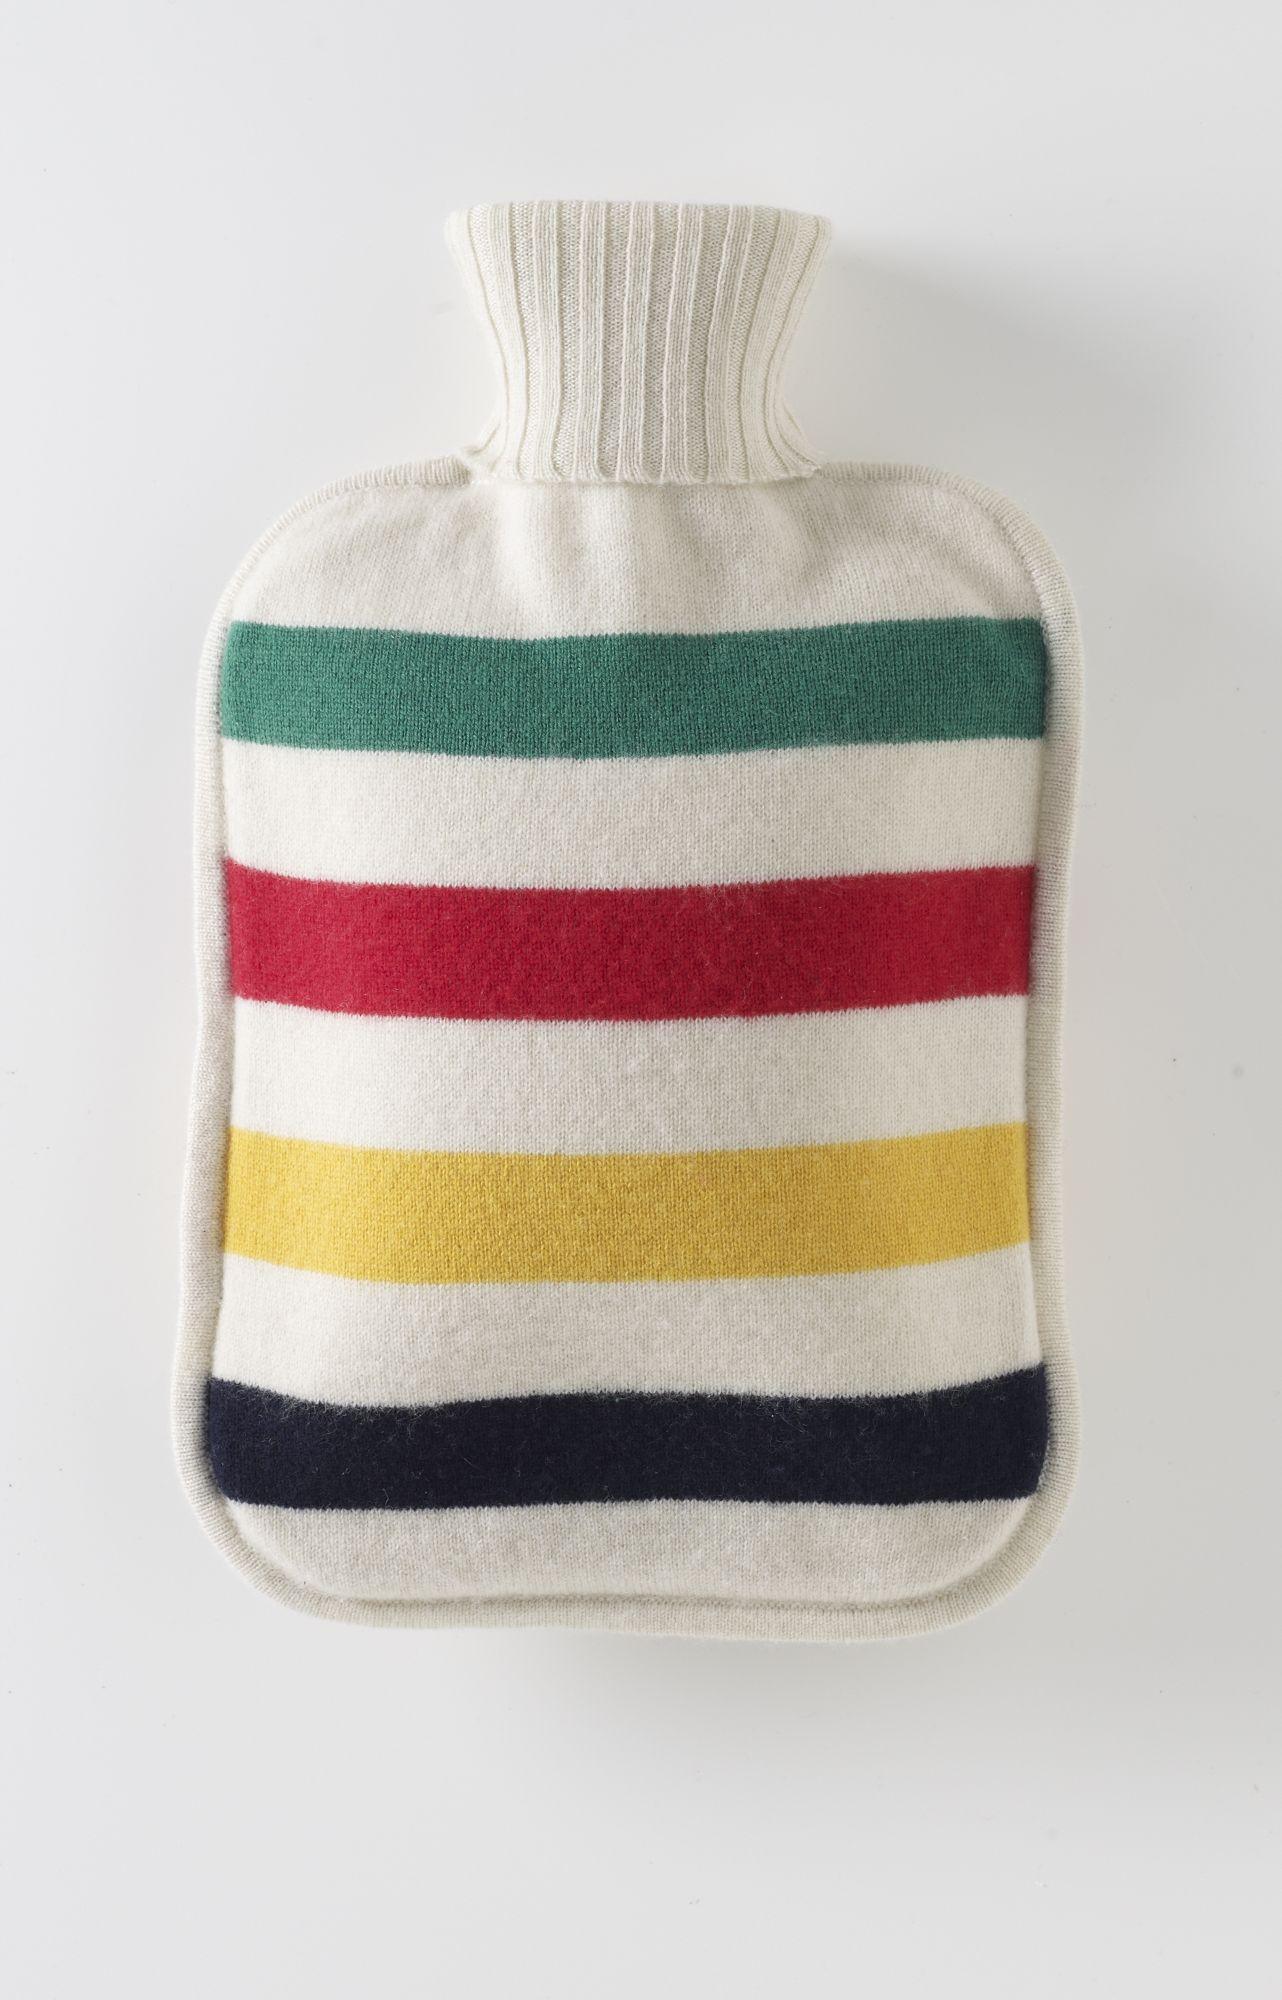 Hudson S Bay Company Blanket Stripes Hot Water Bottle